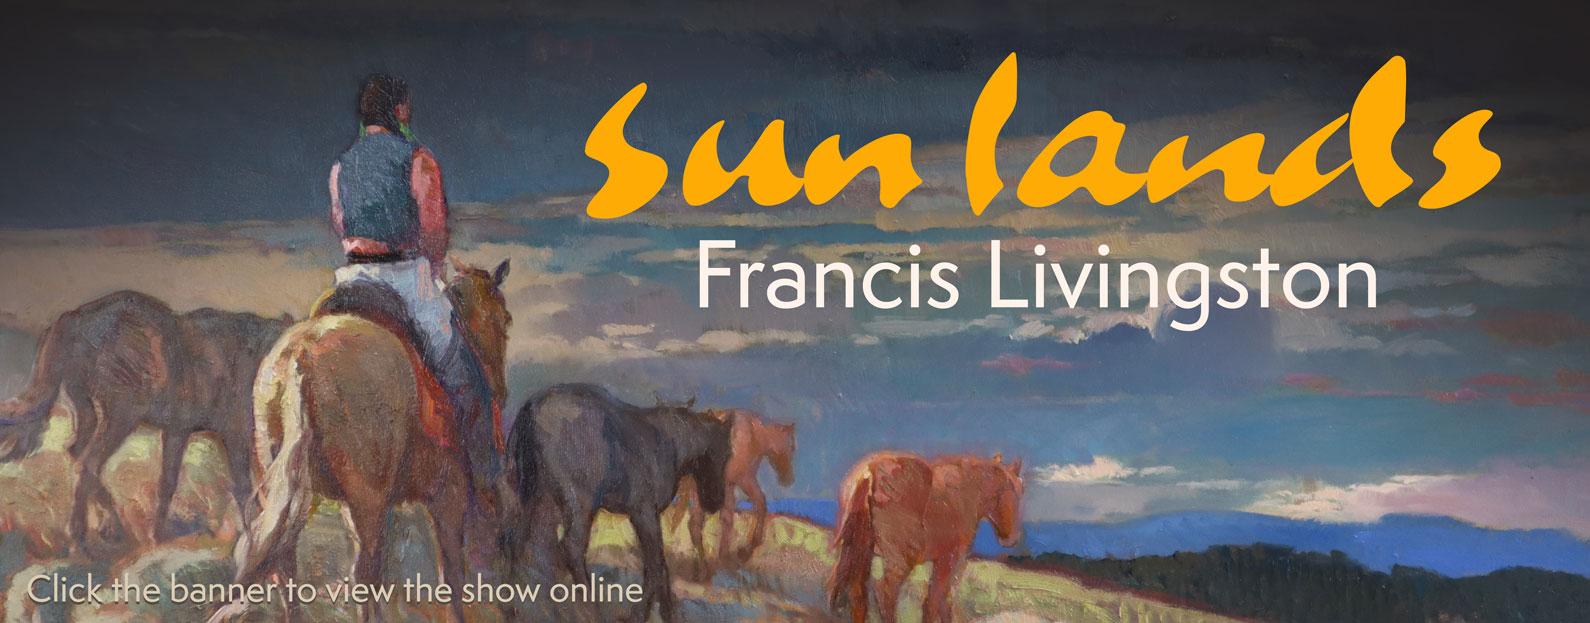 Francis Livingston: Sunlands